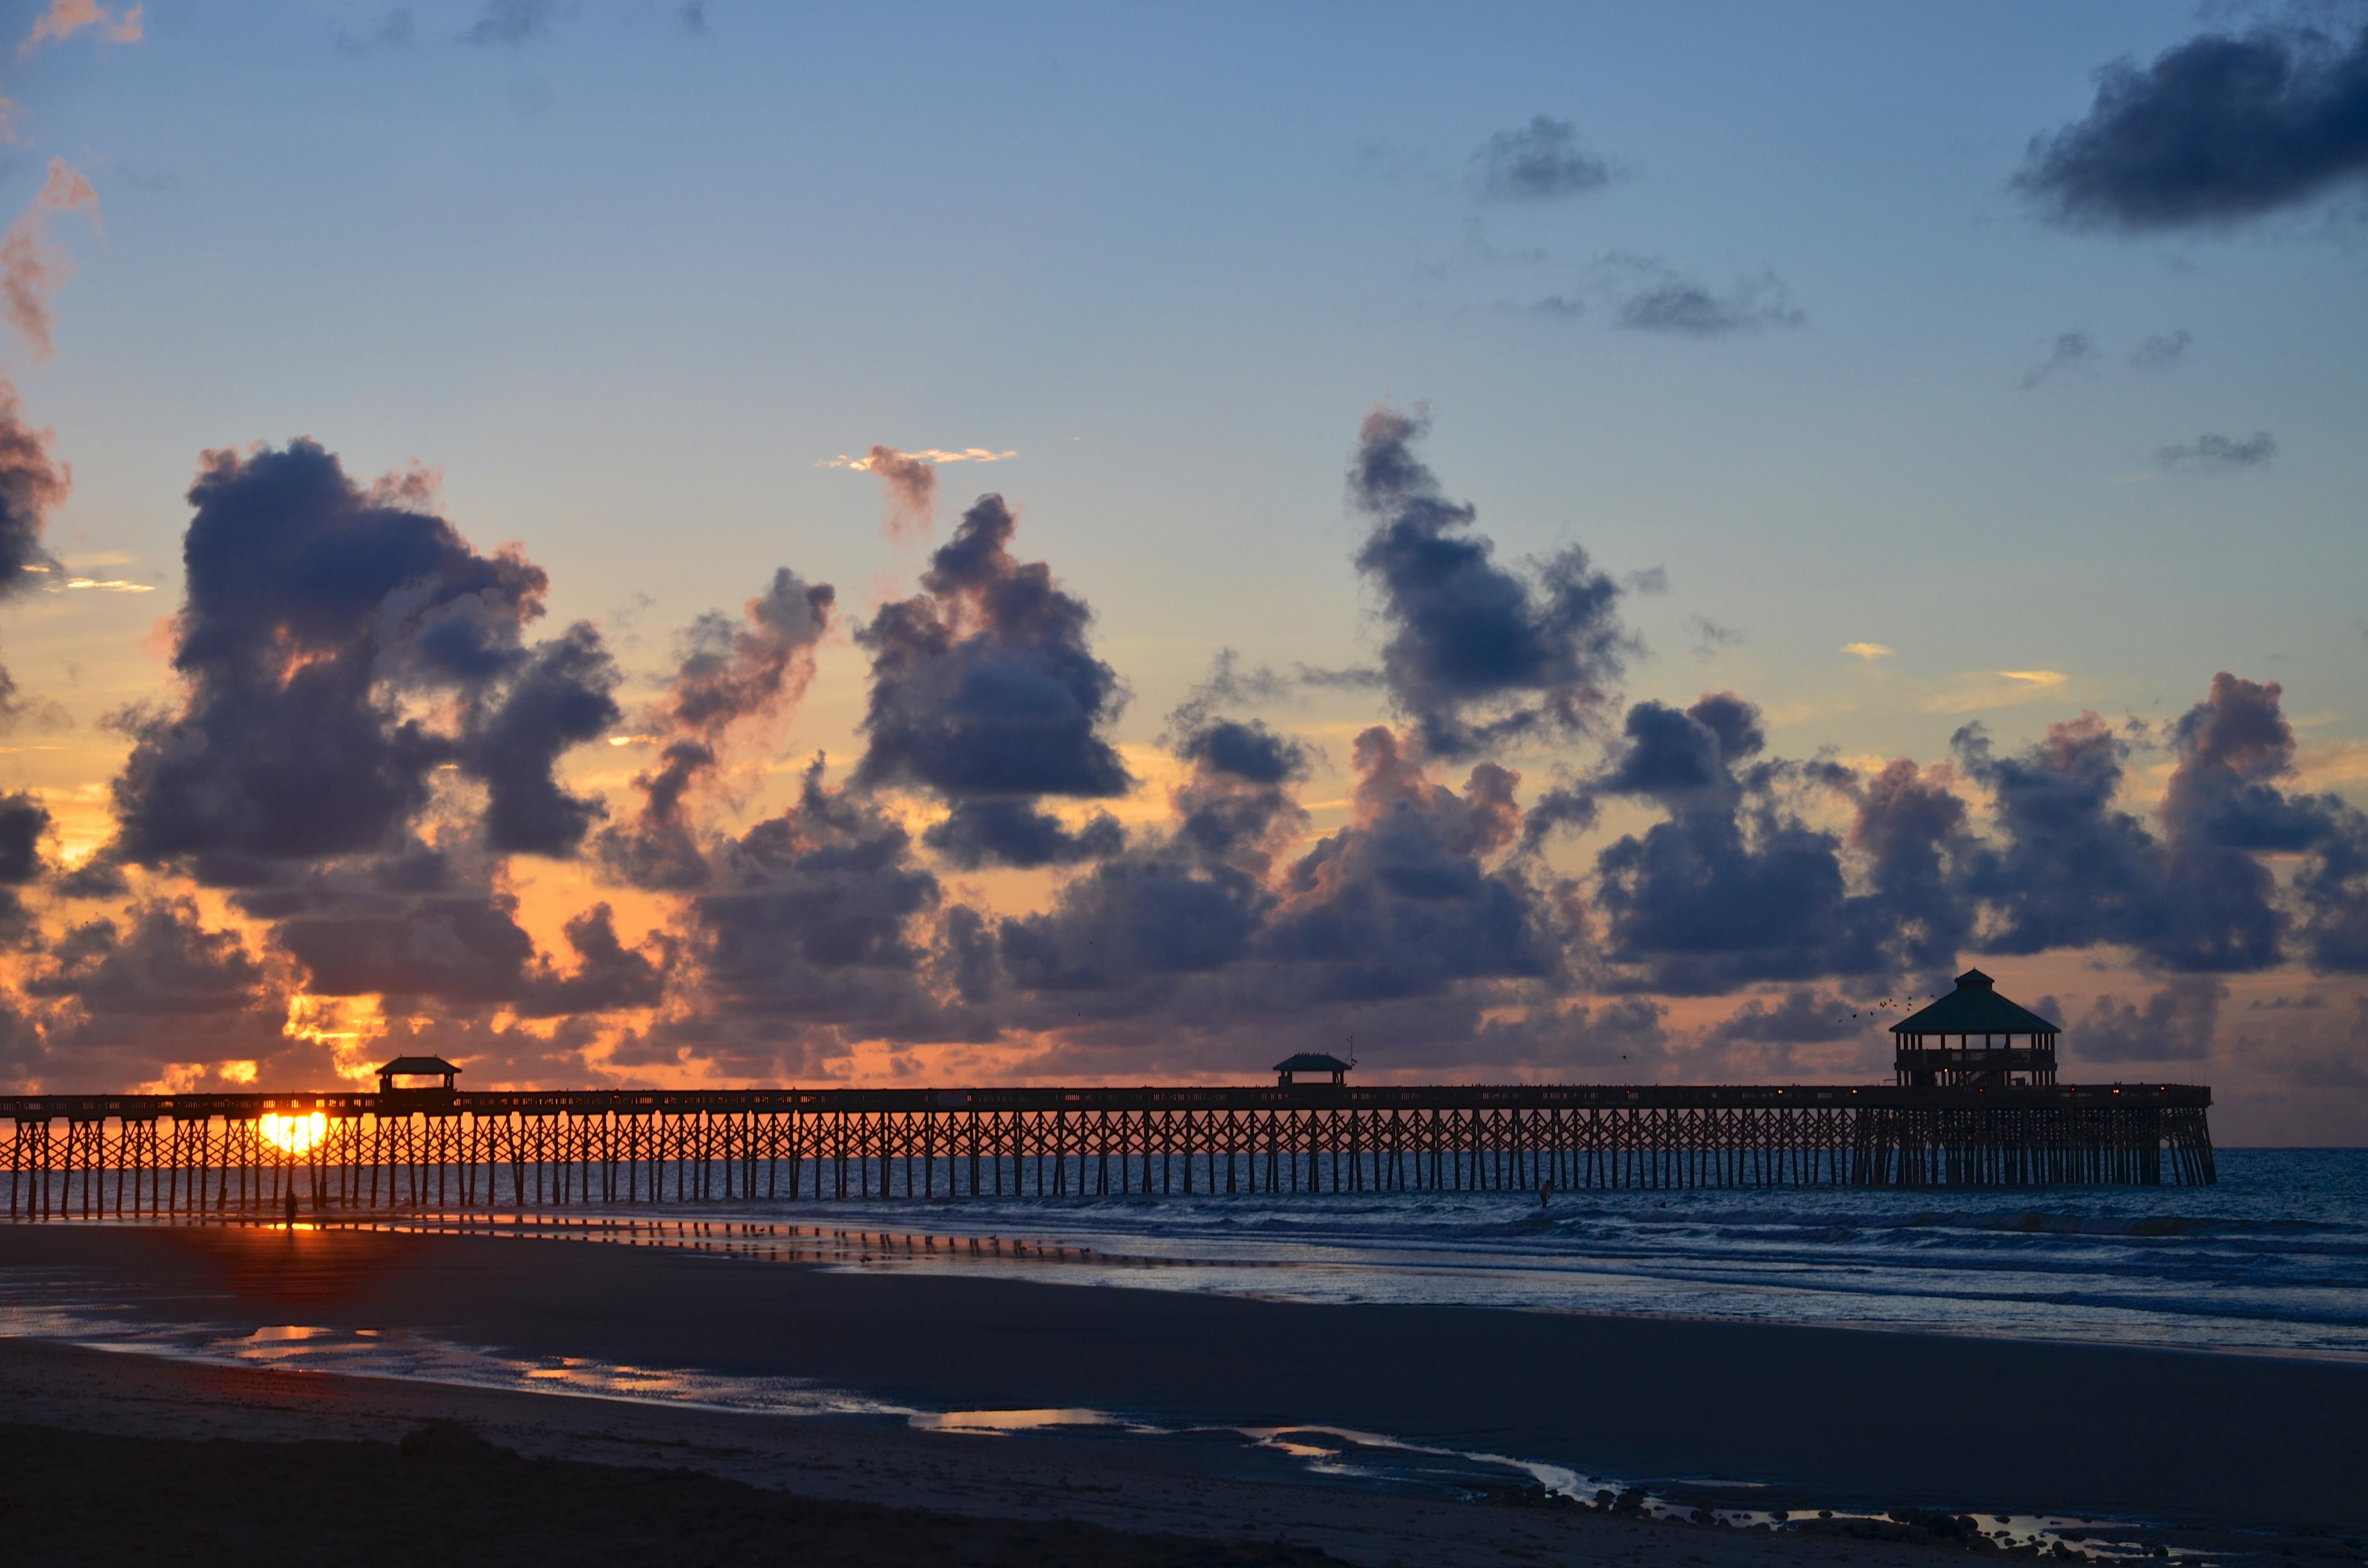 The pier on Folly Beach, South Carolina